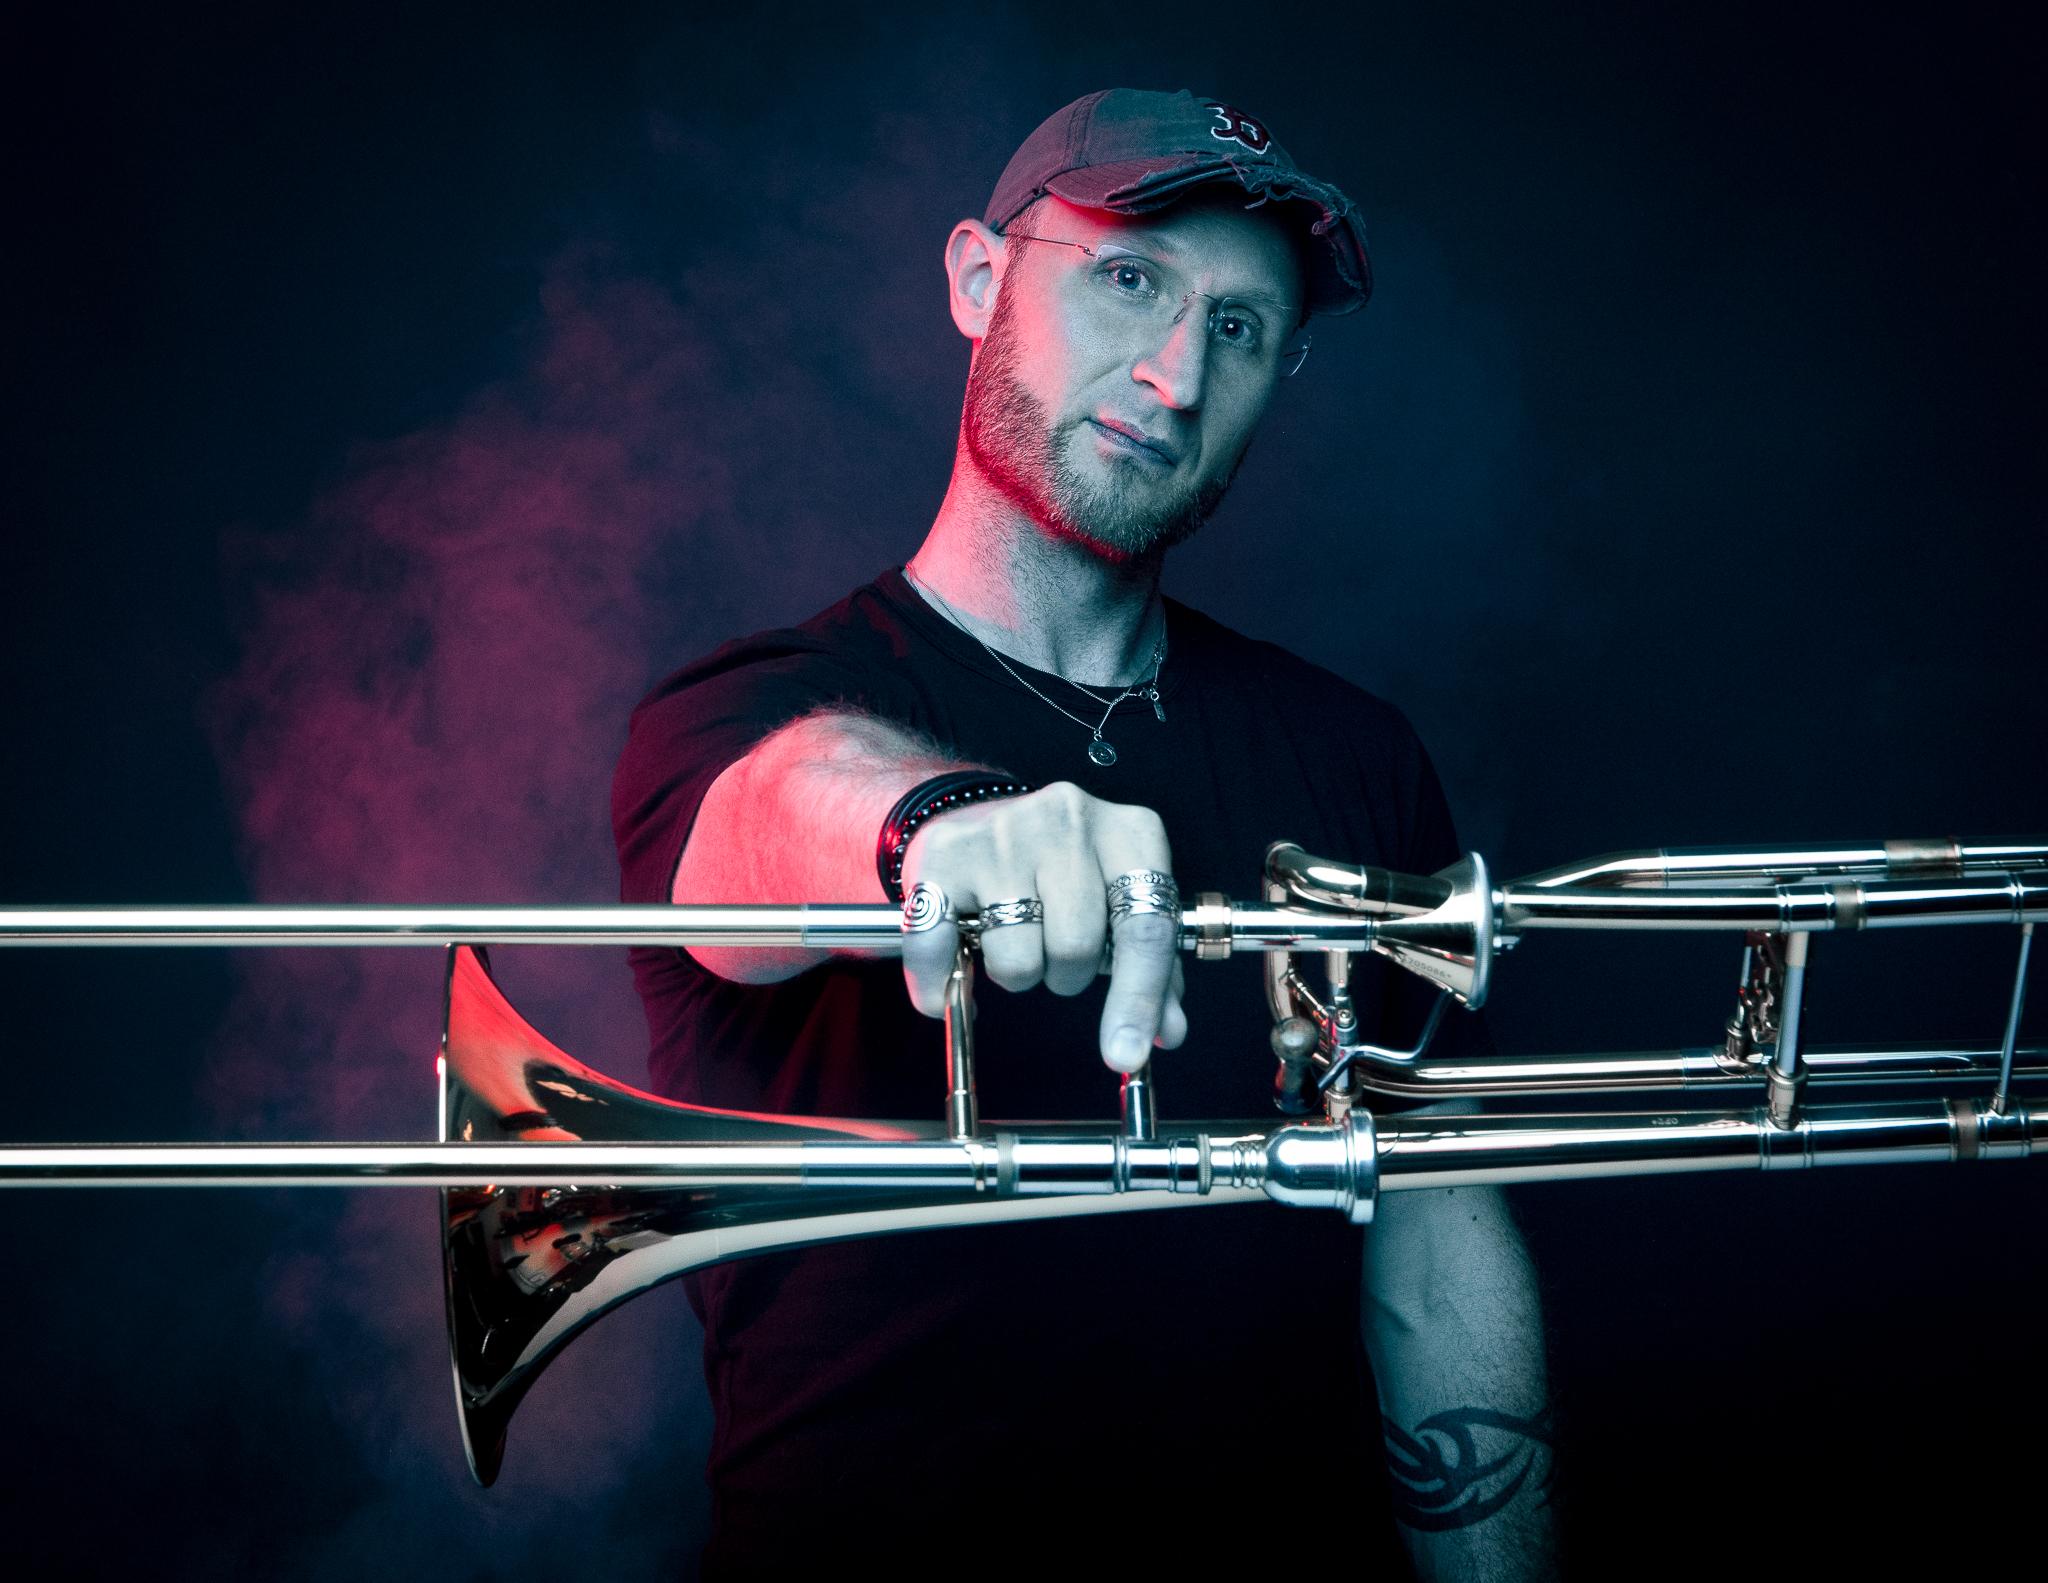 Toby_Oft_Edwards_Trombone.jpg